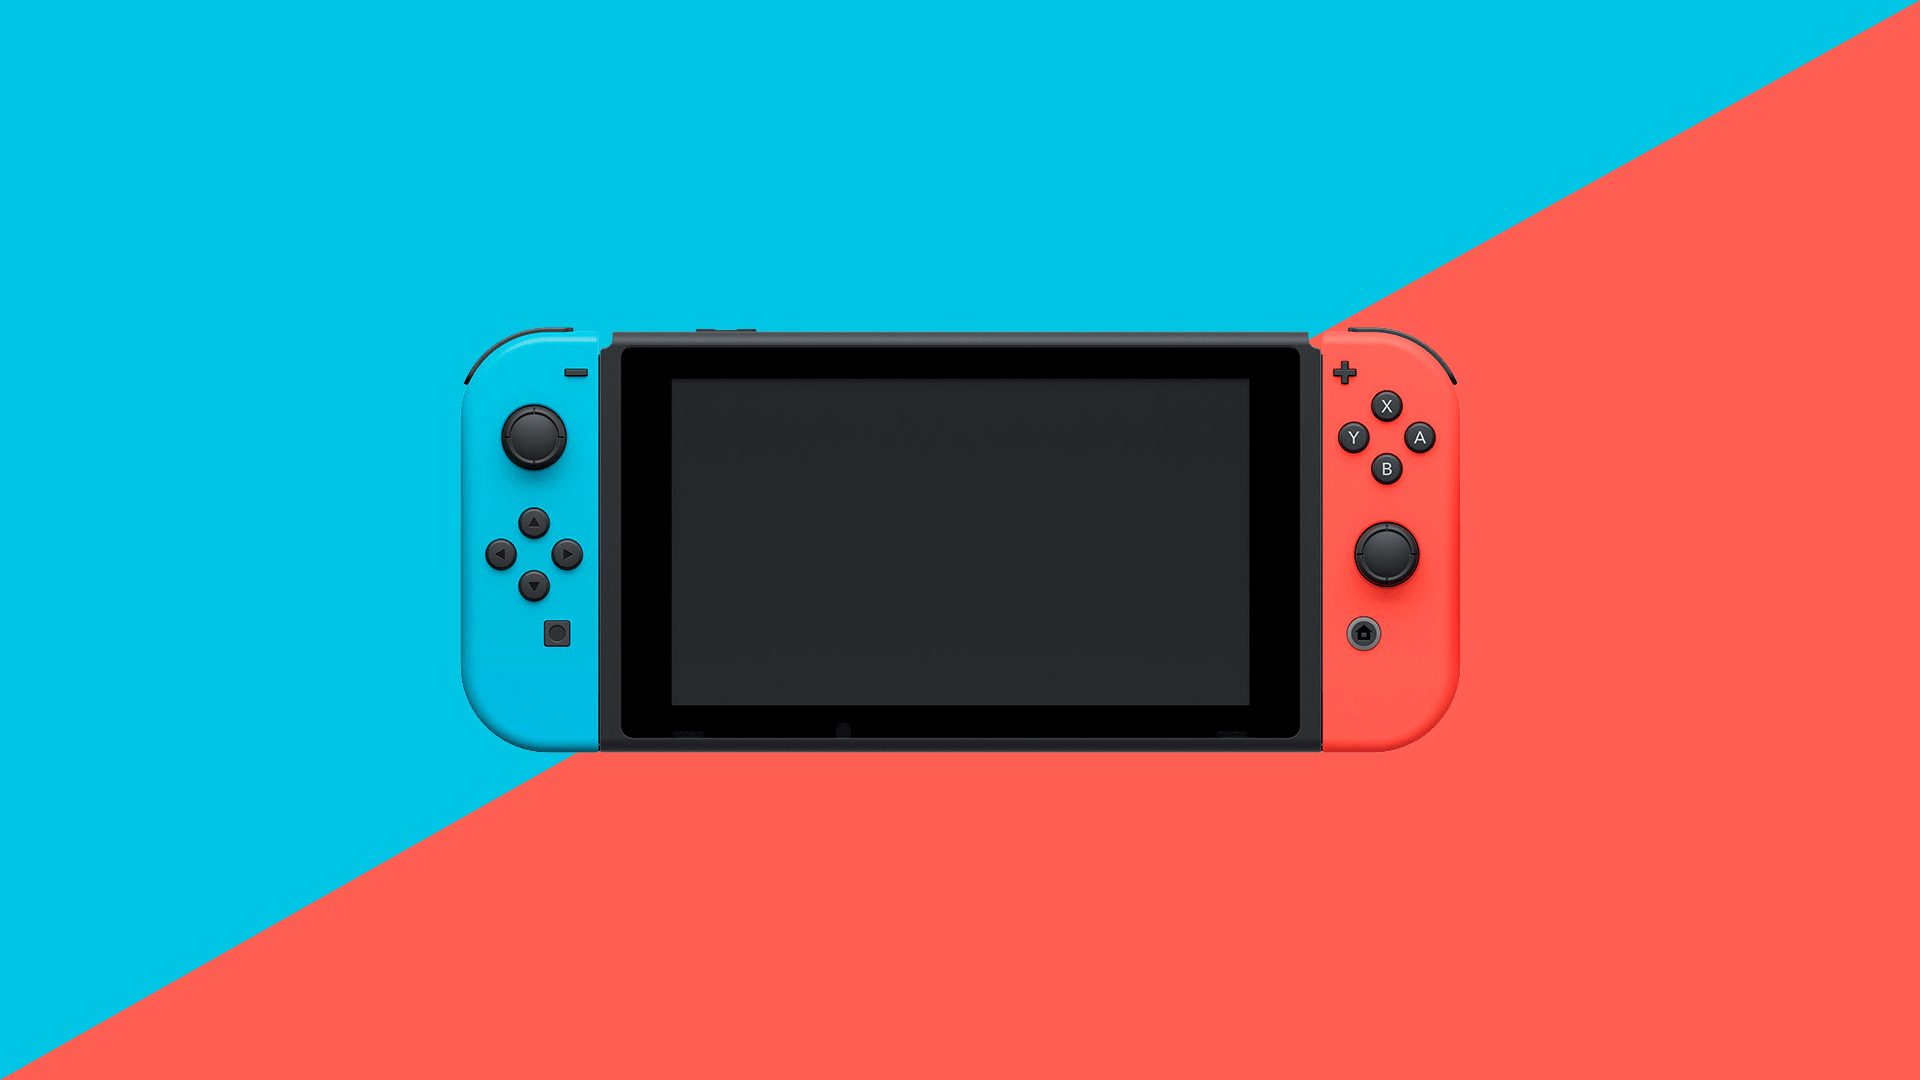 Nintendo Switch Lite Wallpapers Wallpaper Cave